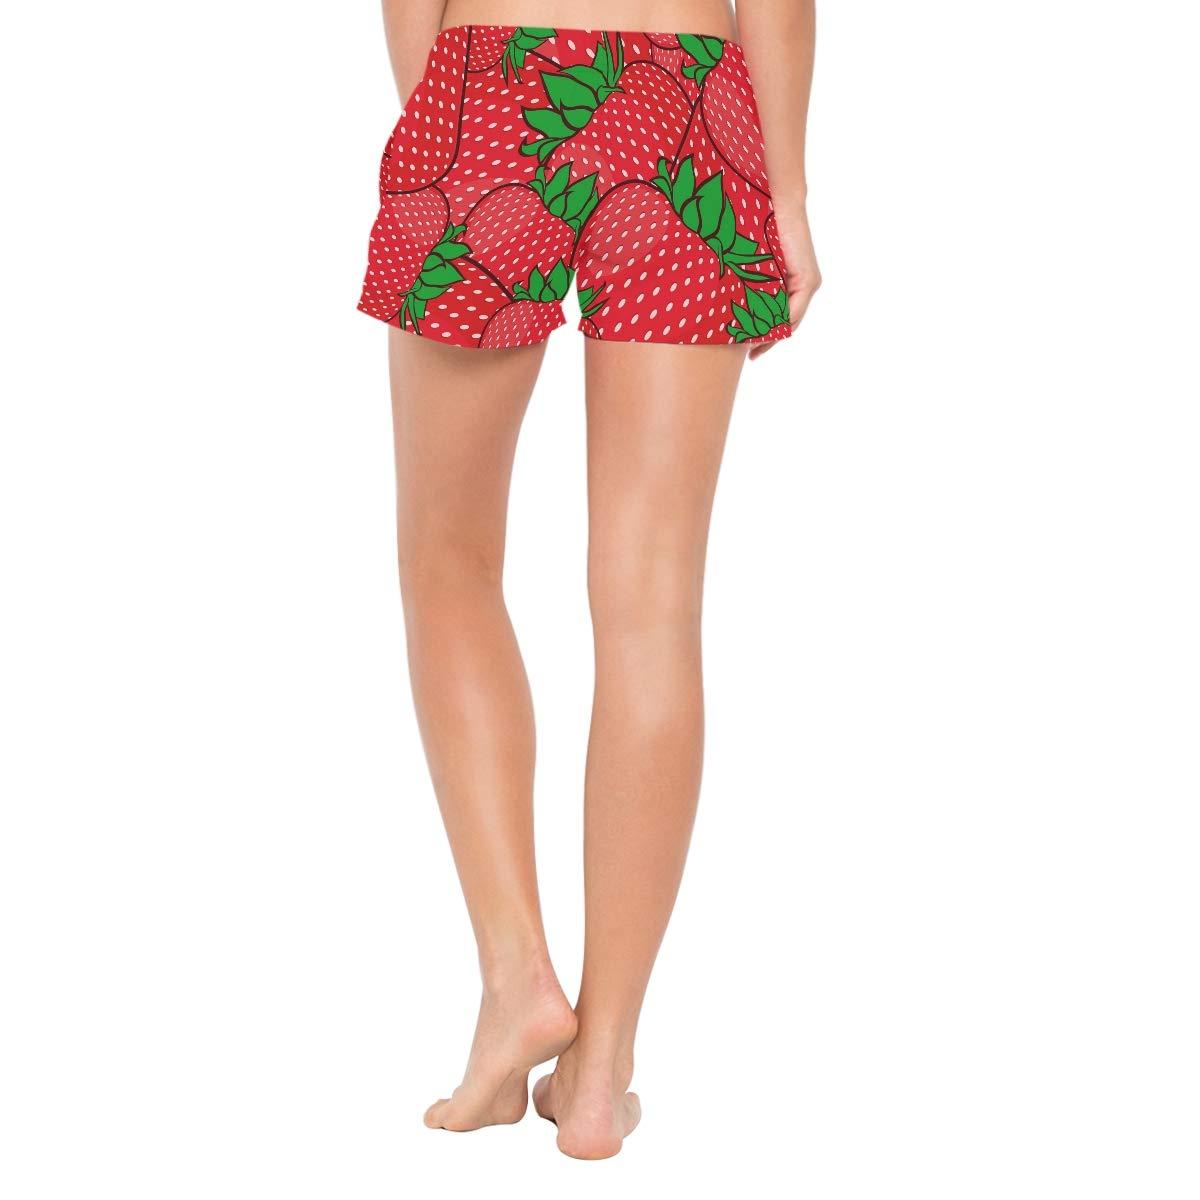 Women Swim Trunks Summer Strawberries Pattern Red Beach Board Shorts